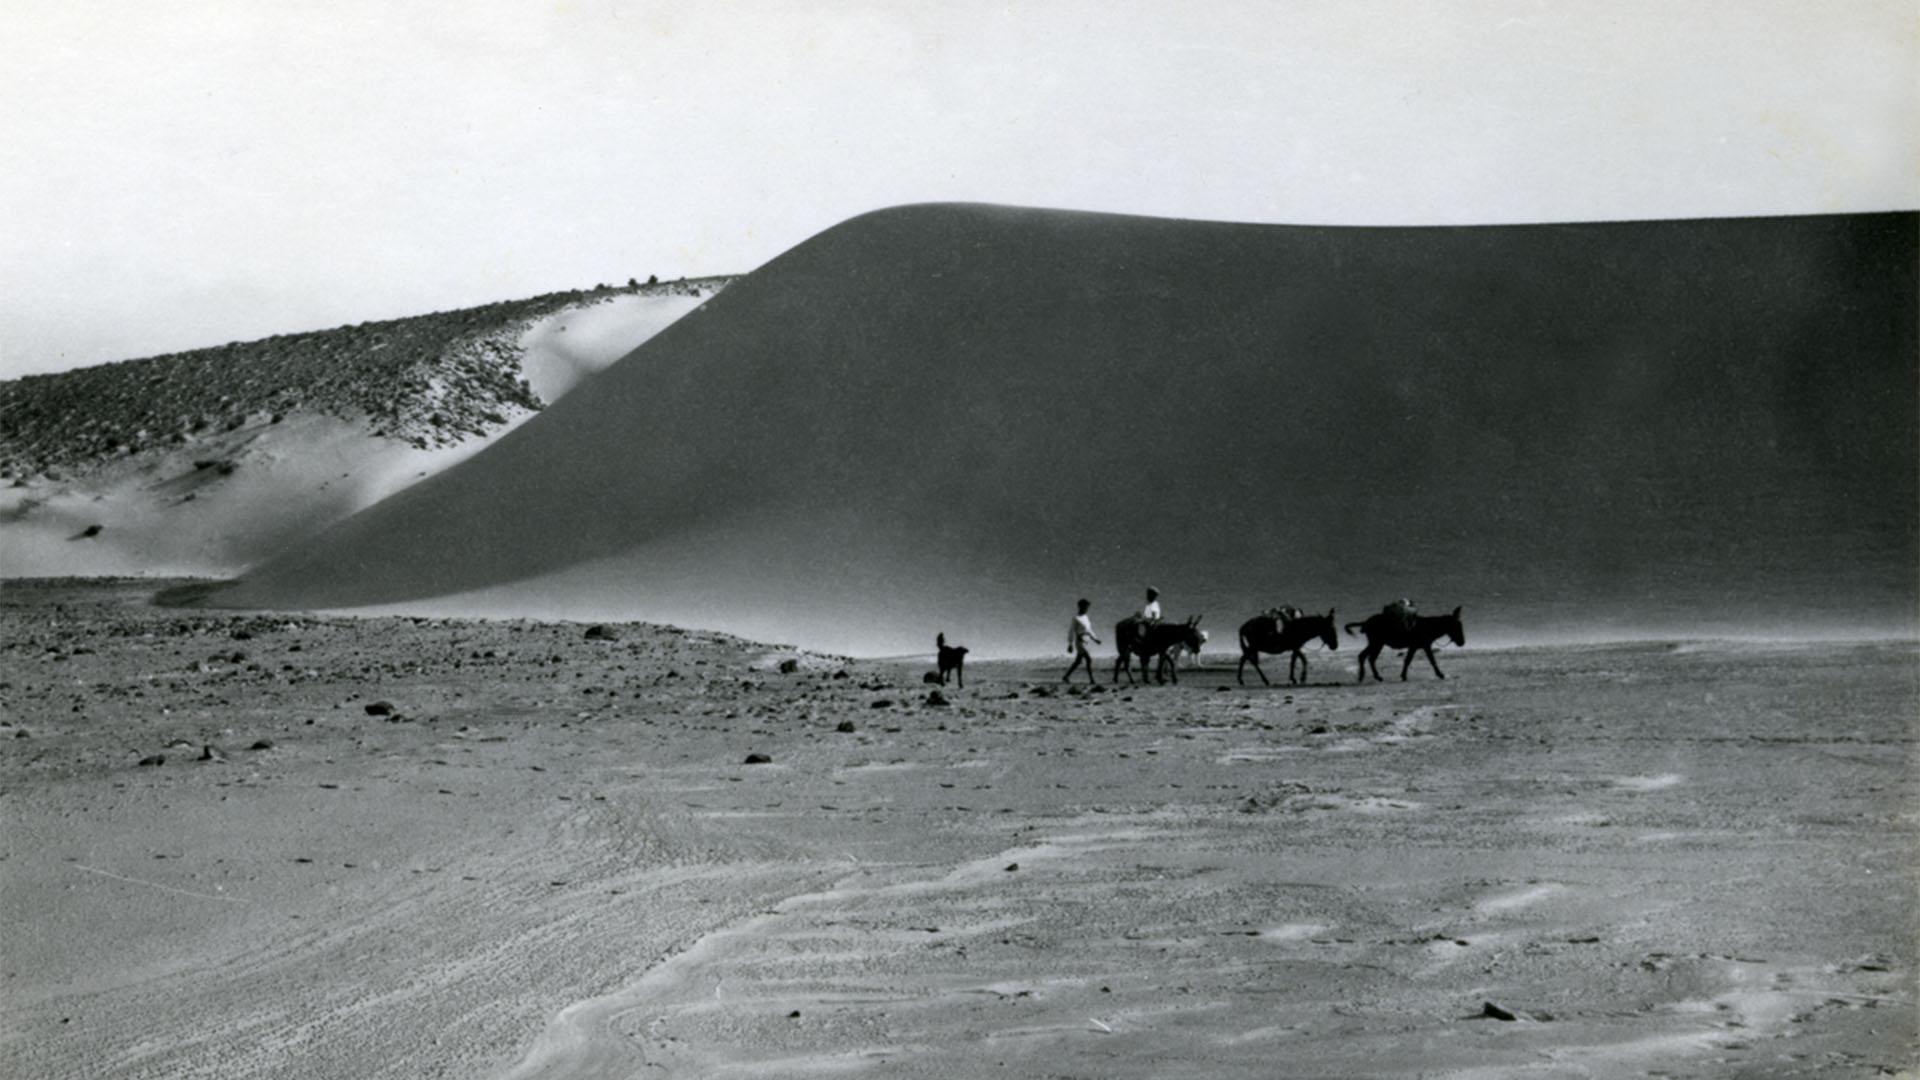 El Jable Dunas de Corralejo Fuerteventura – historische Aufnahme ohne Jahr.